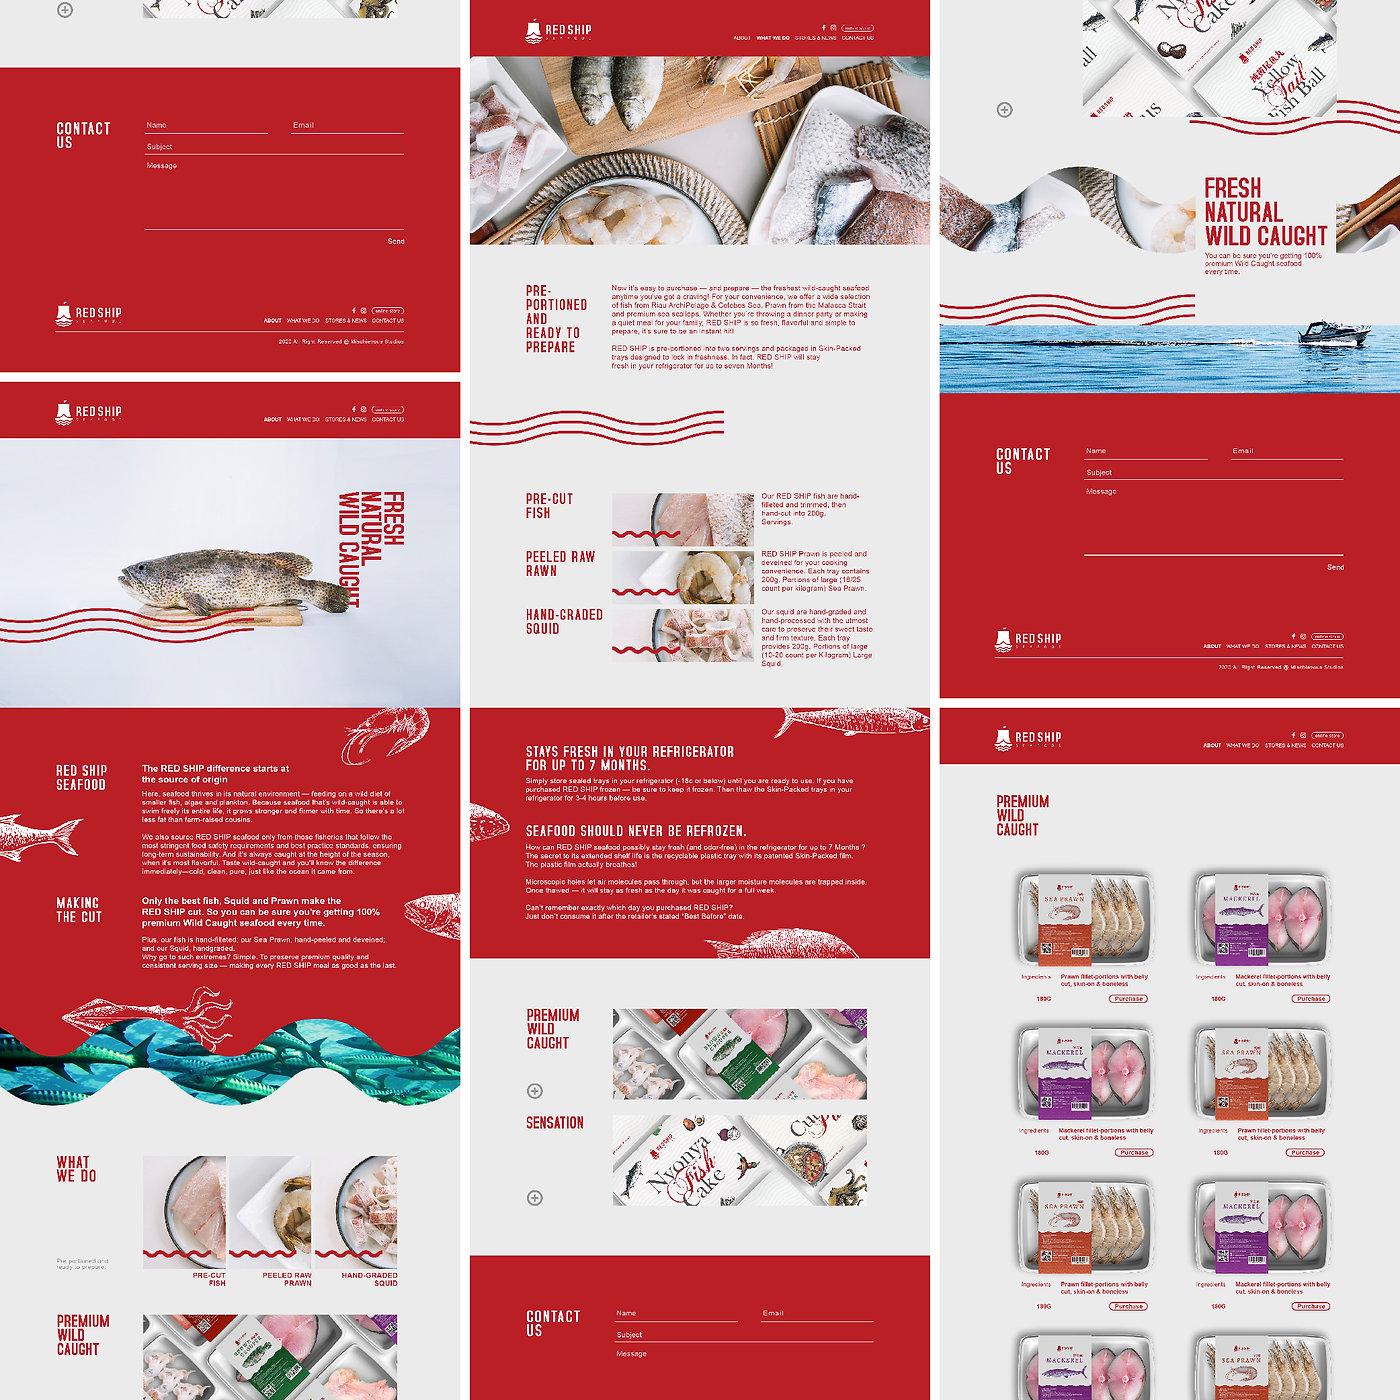 Red Ship Web Design.jpg